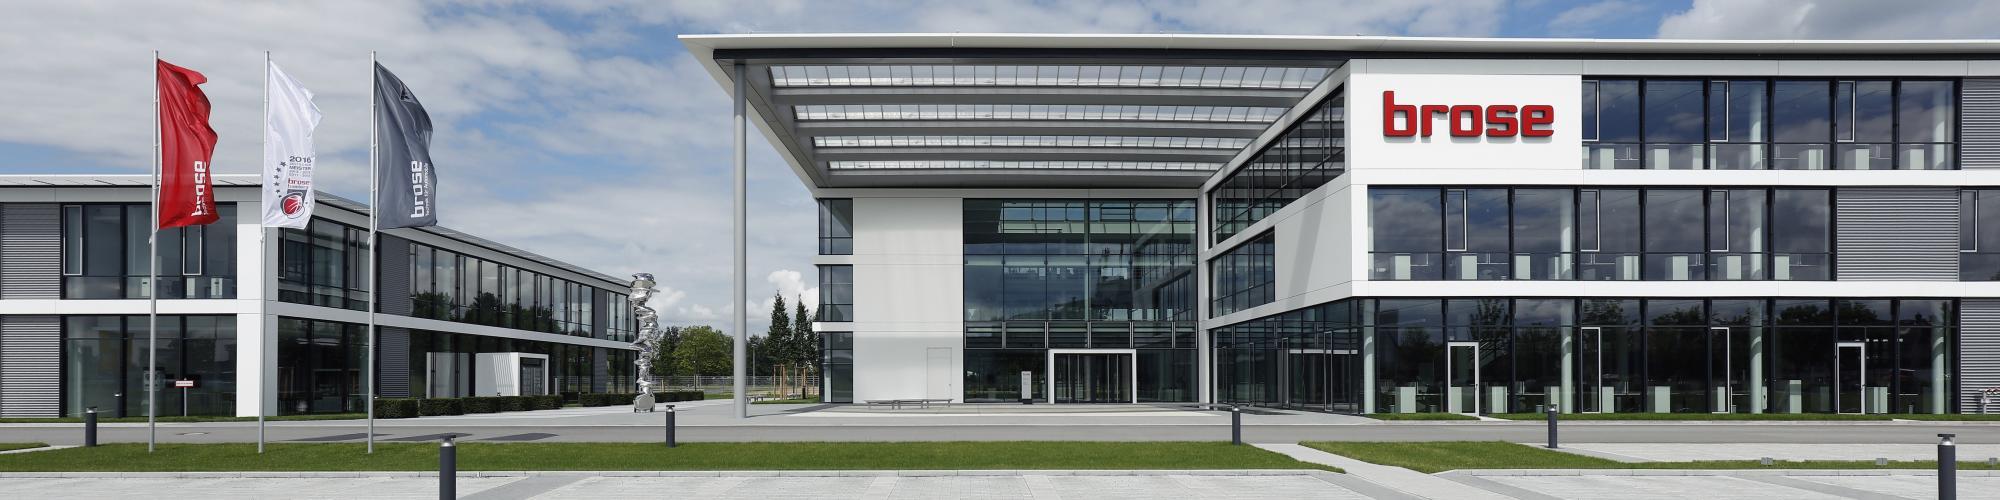 Brose Fahrzeugteile GmbH & Co. Kommanditgesellschaft, Coburg